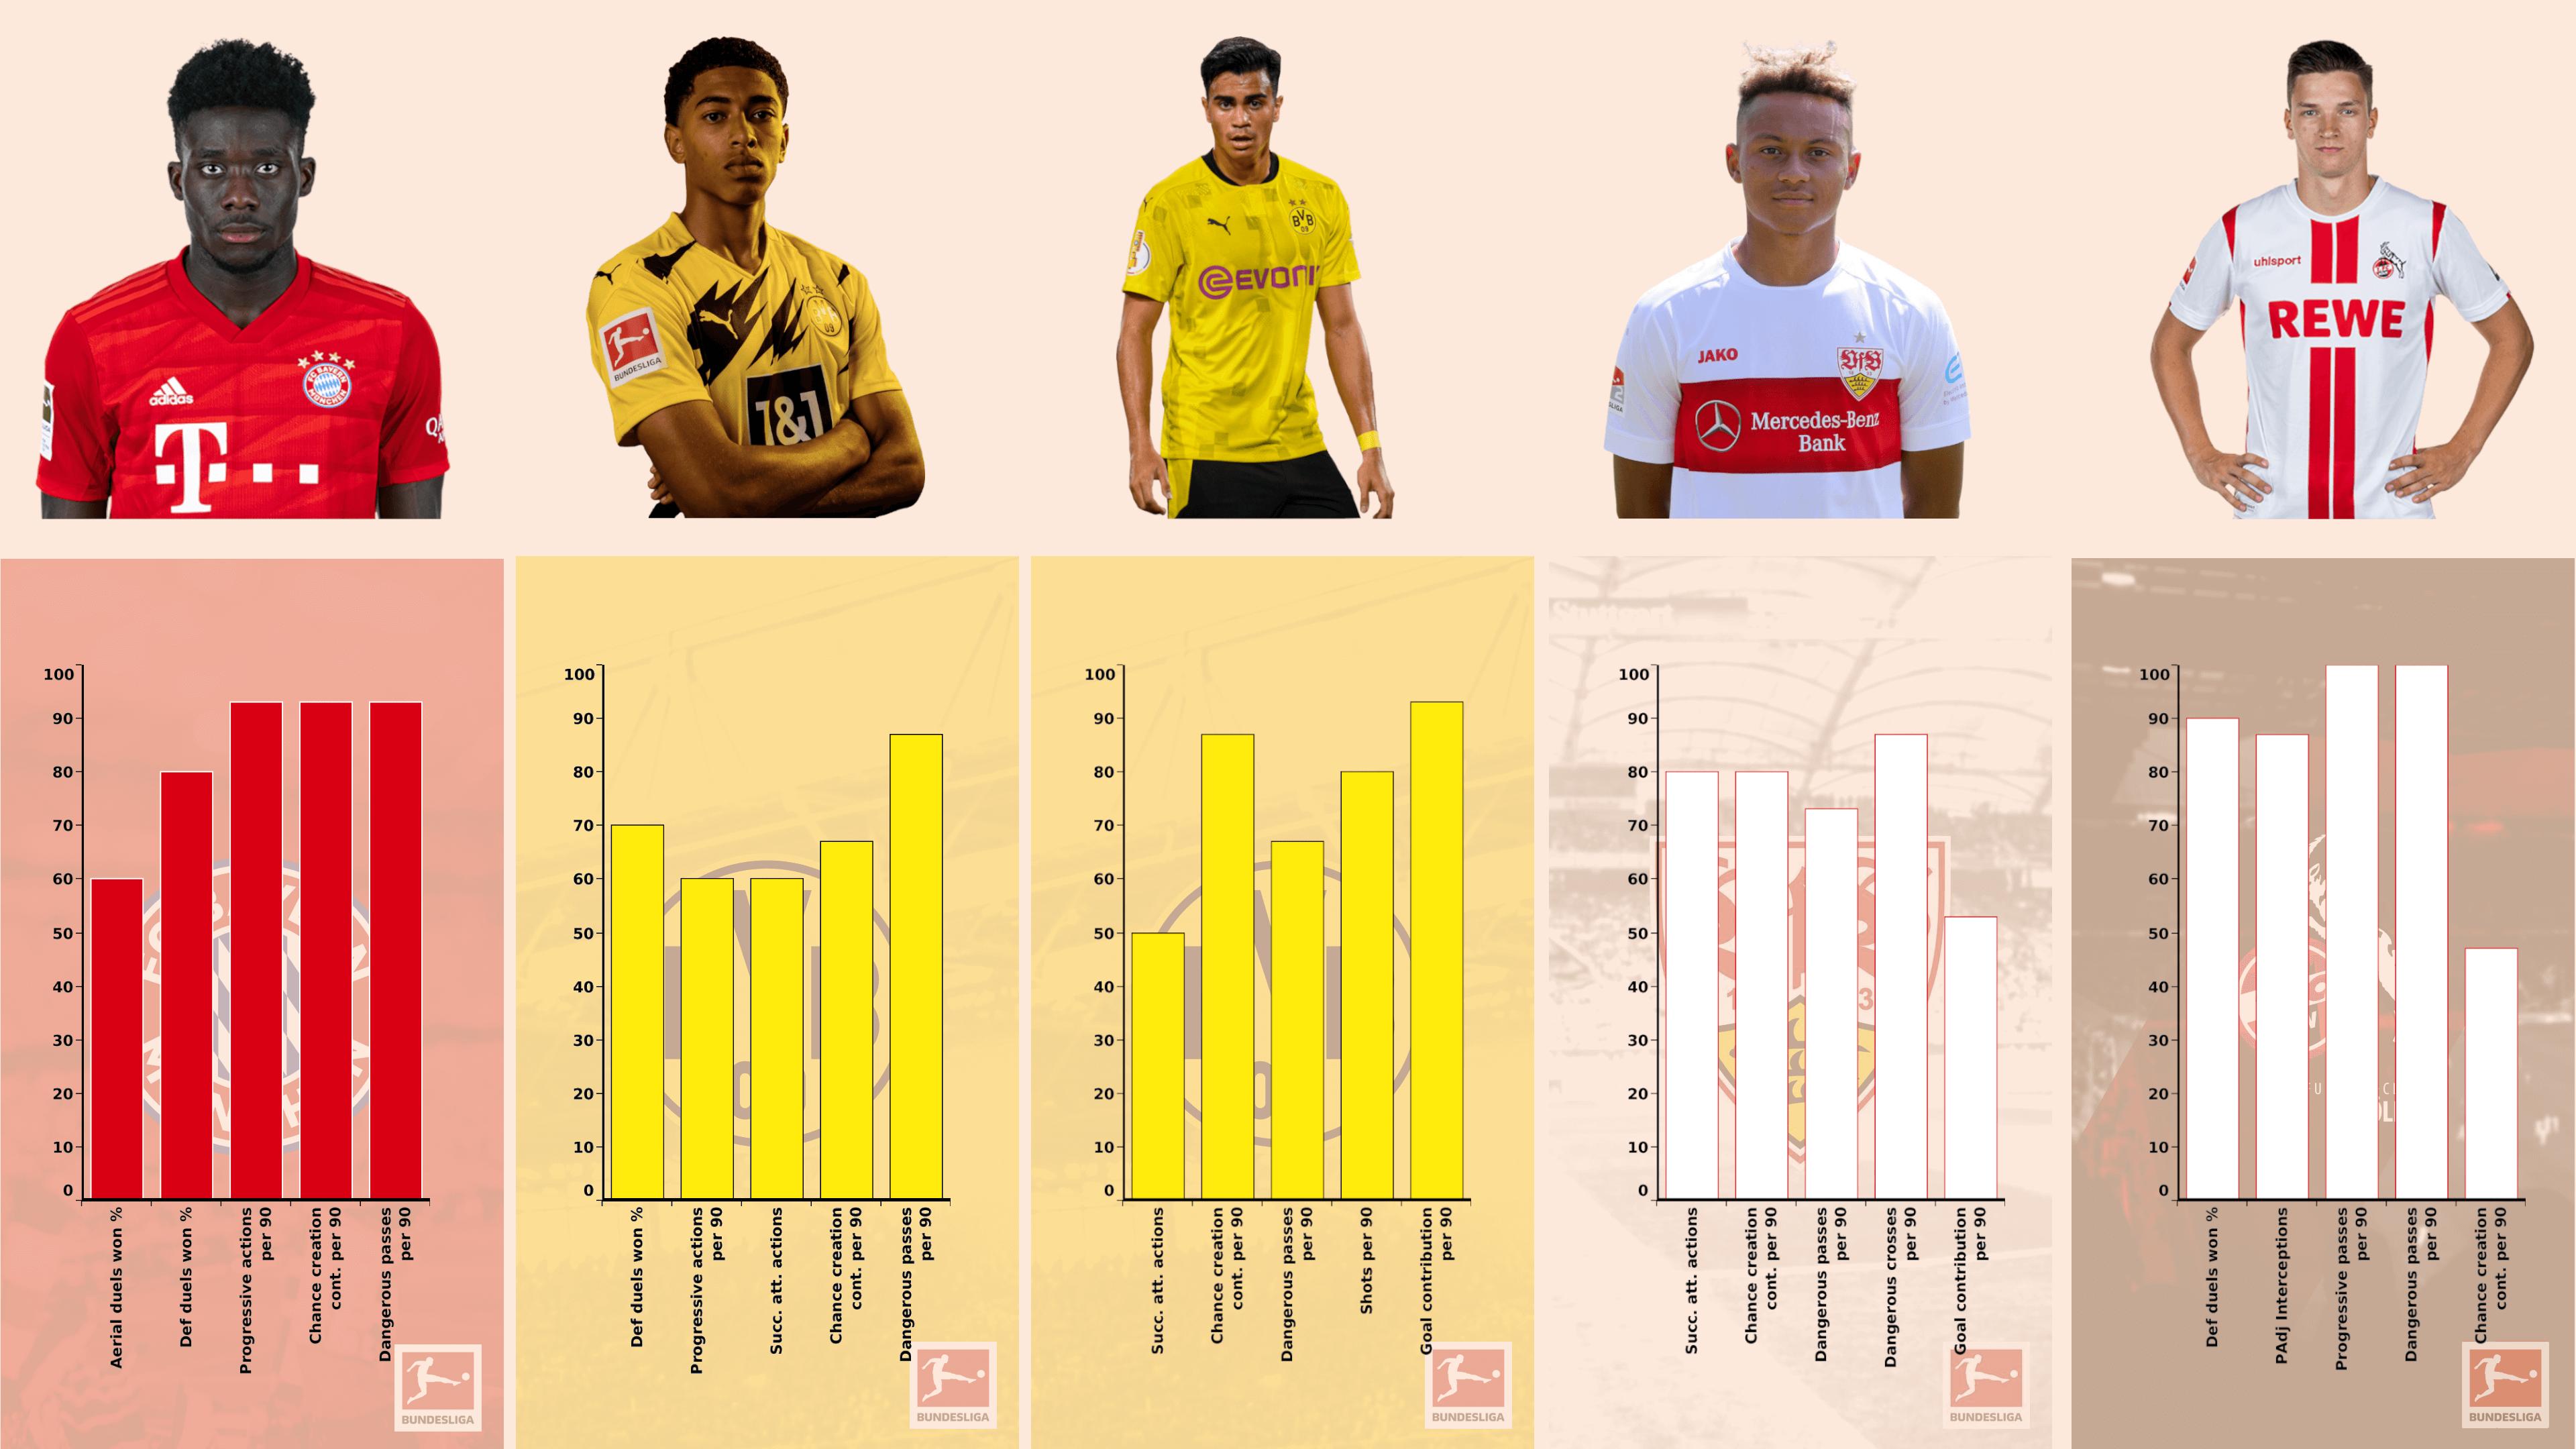 Best teenagers in the Bundesliga - data analysis statistics